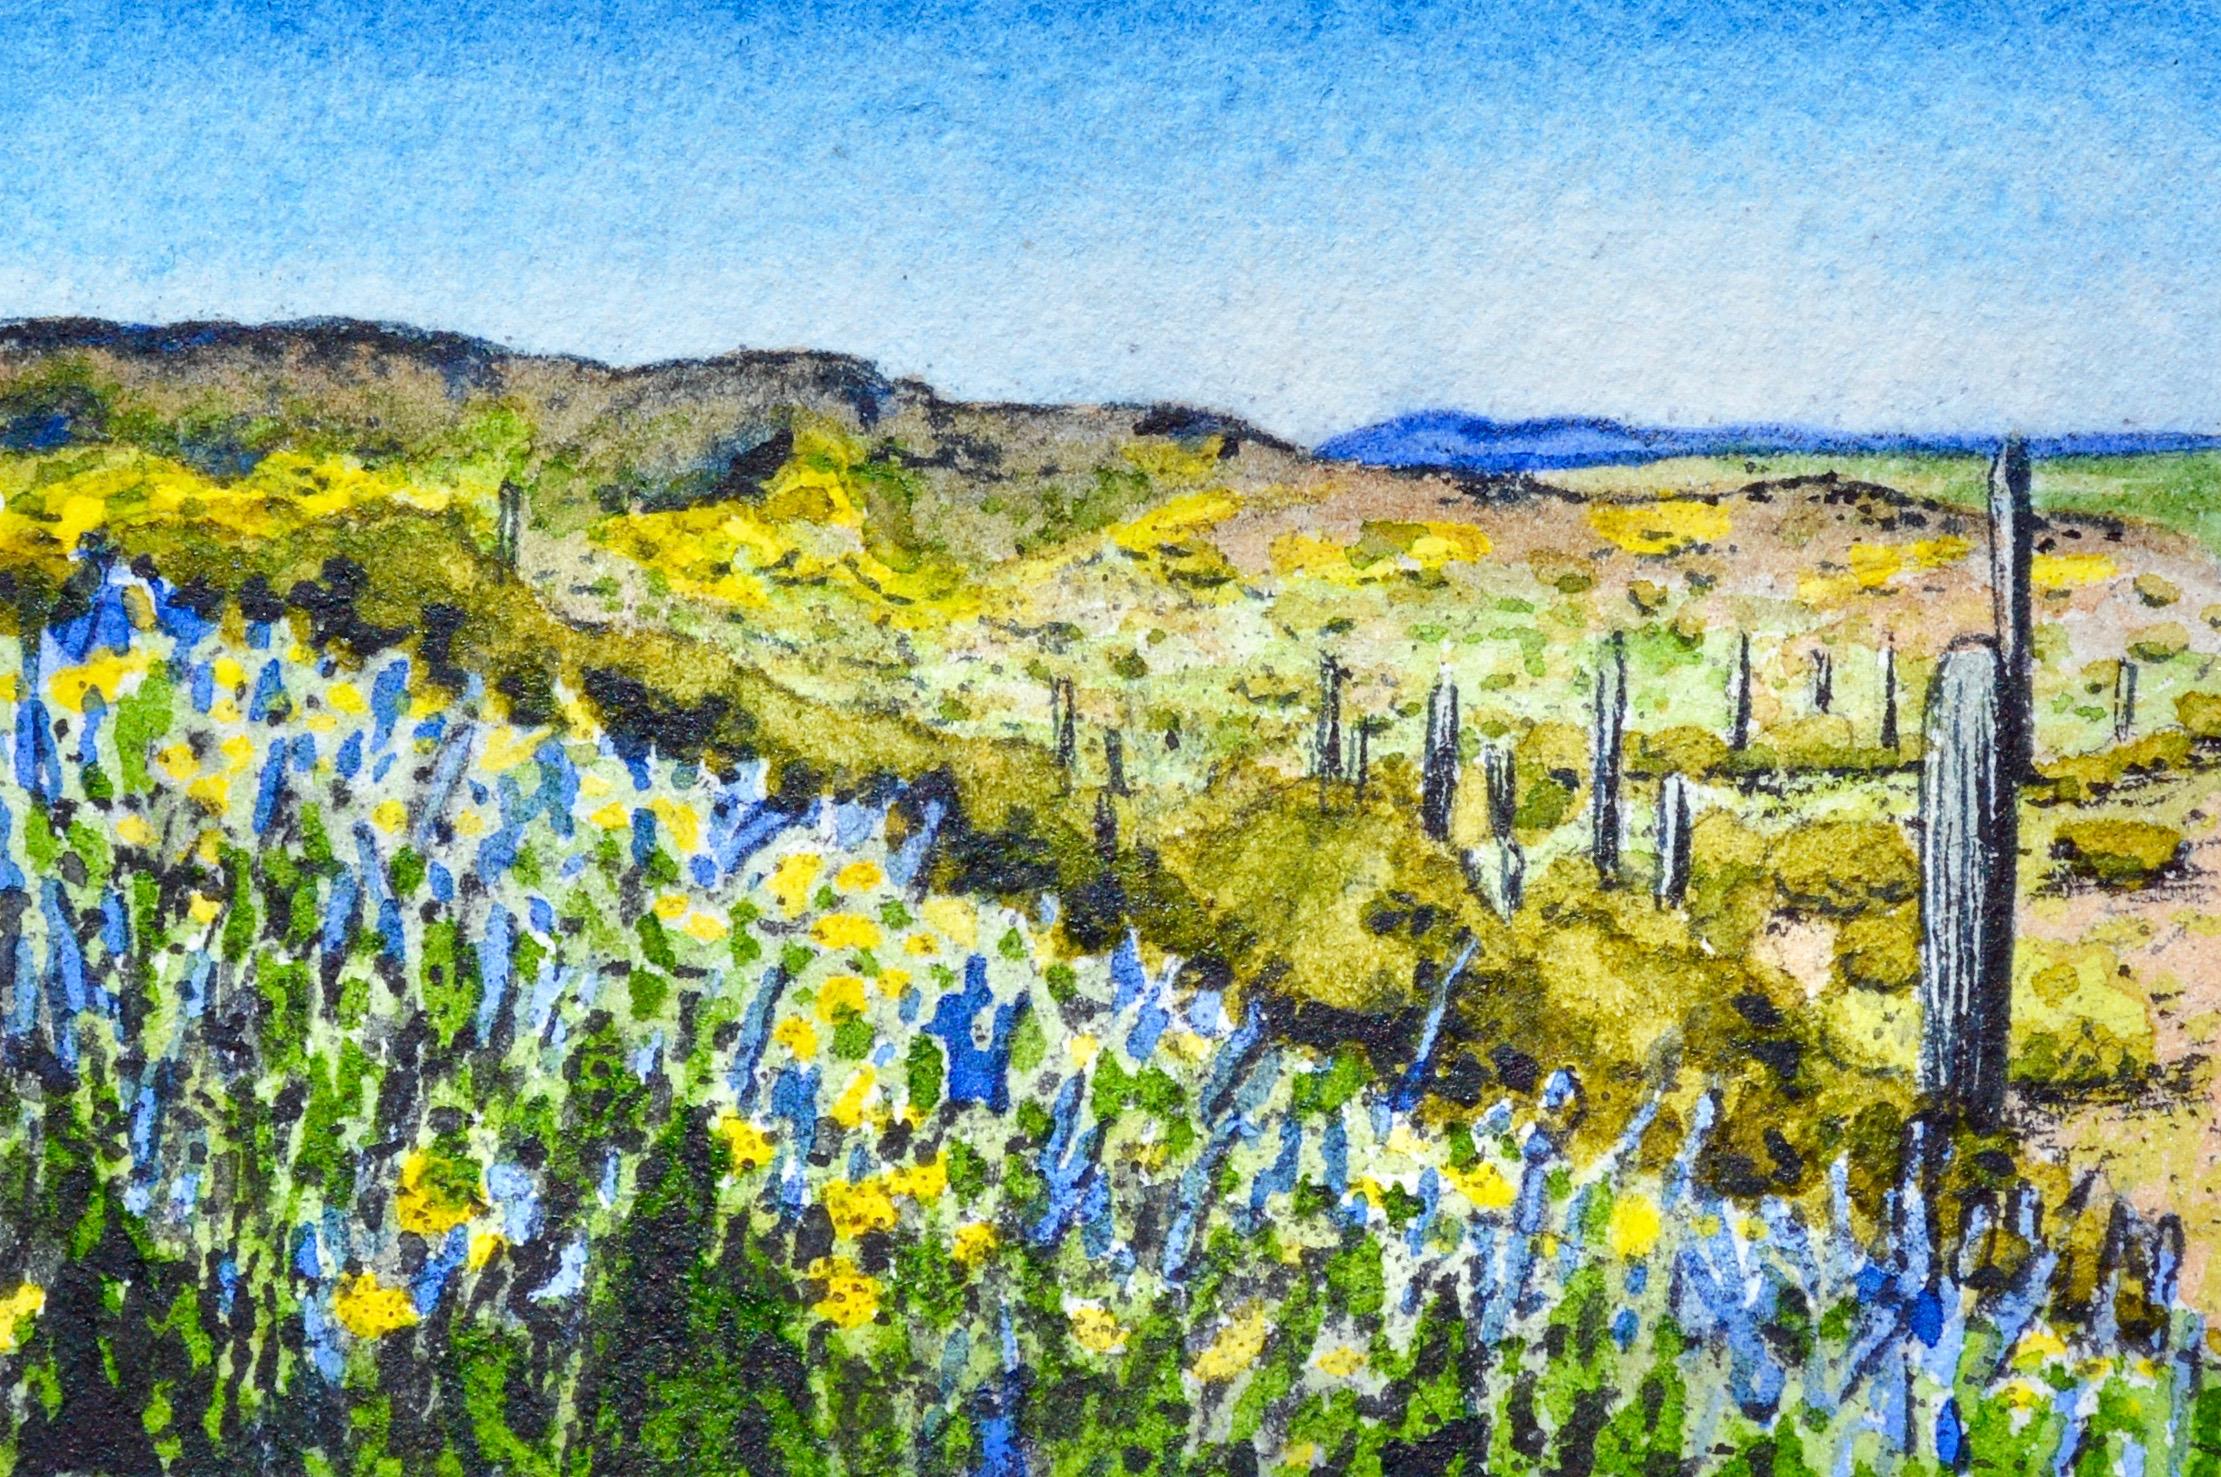 """Picacho Peak State Park, Arizona: 3/6,19, 9:39:03"" SOLD 3x2"""